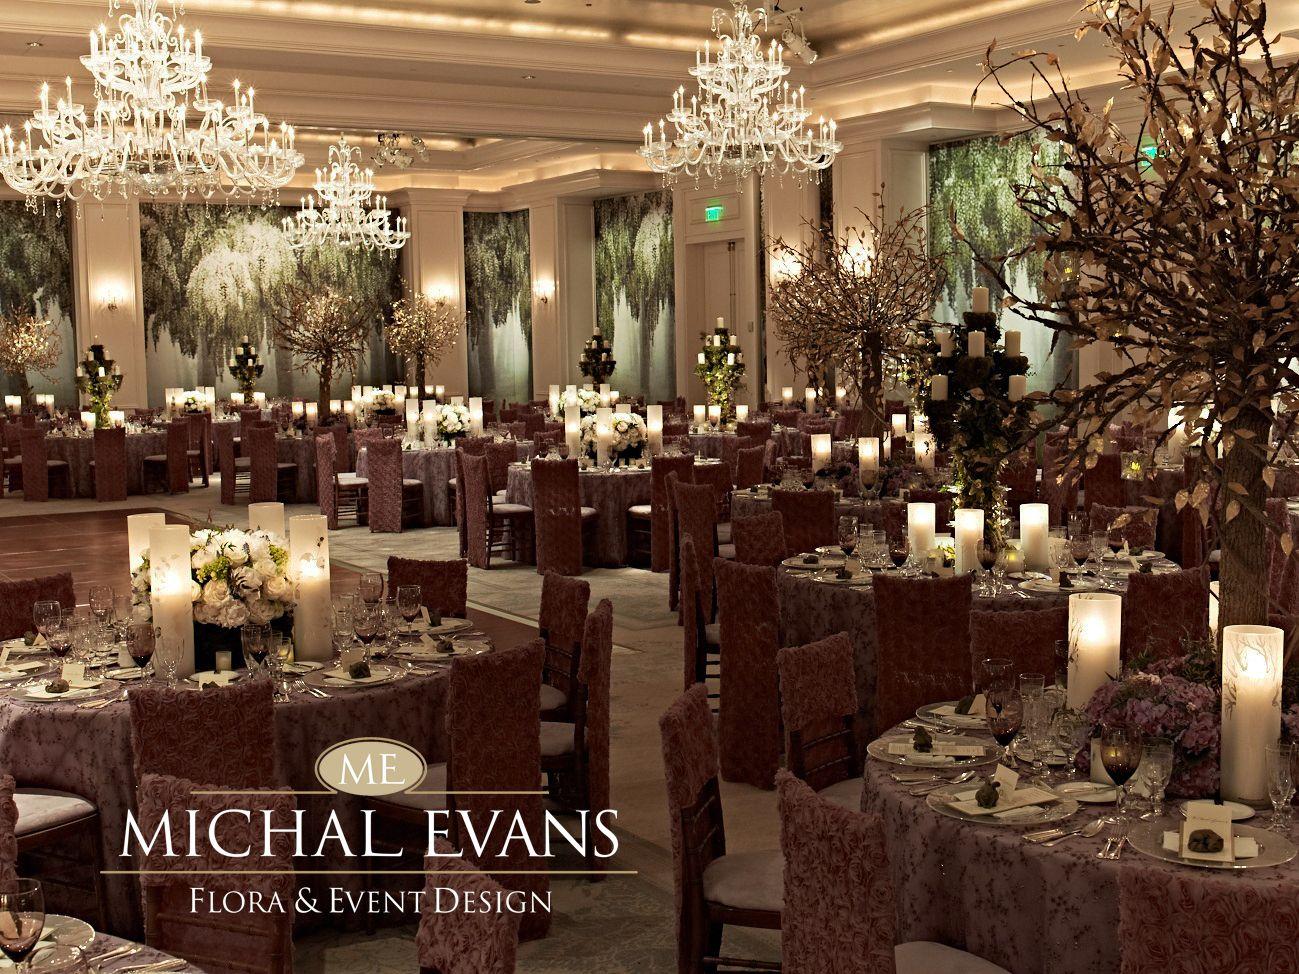 Atlanta floral event design event design design